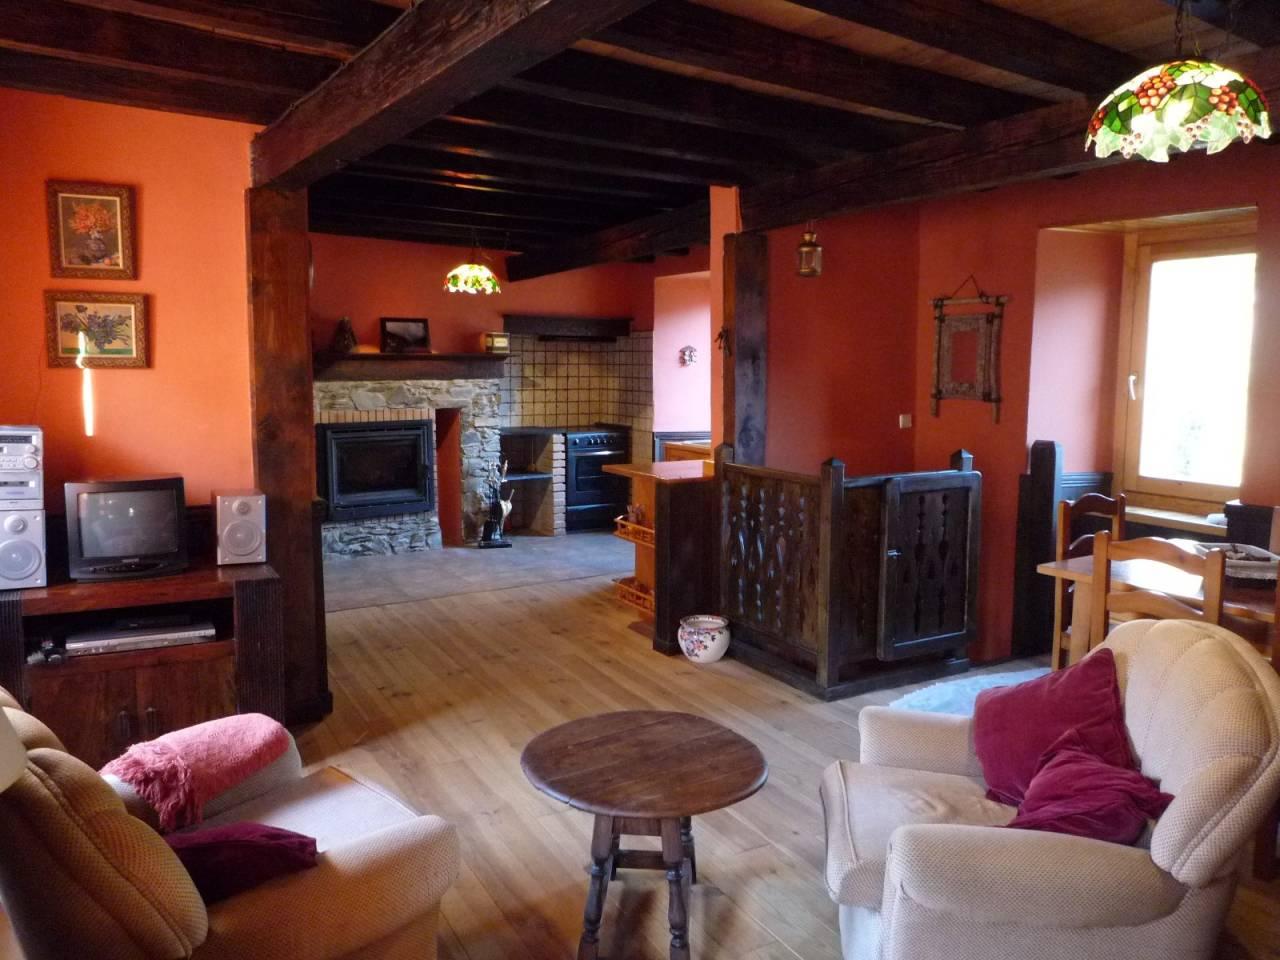 Casa  Calle santa lucia. Superf. 100 m², 100 m² solar,  2 habitaciones (2 dobles),  2 bañ